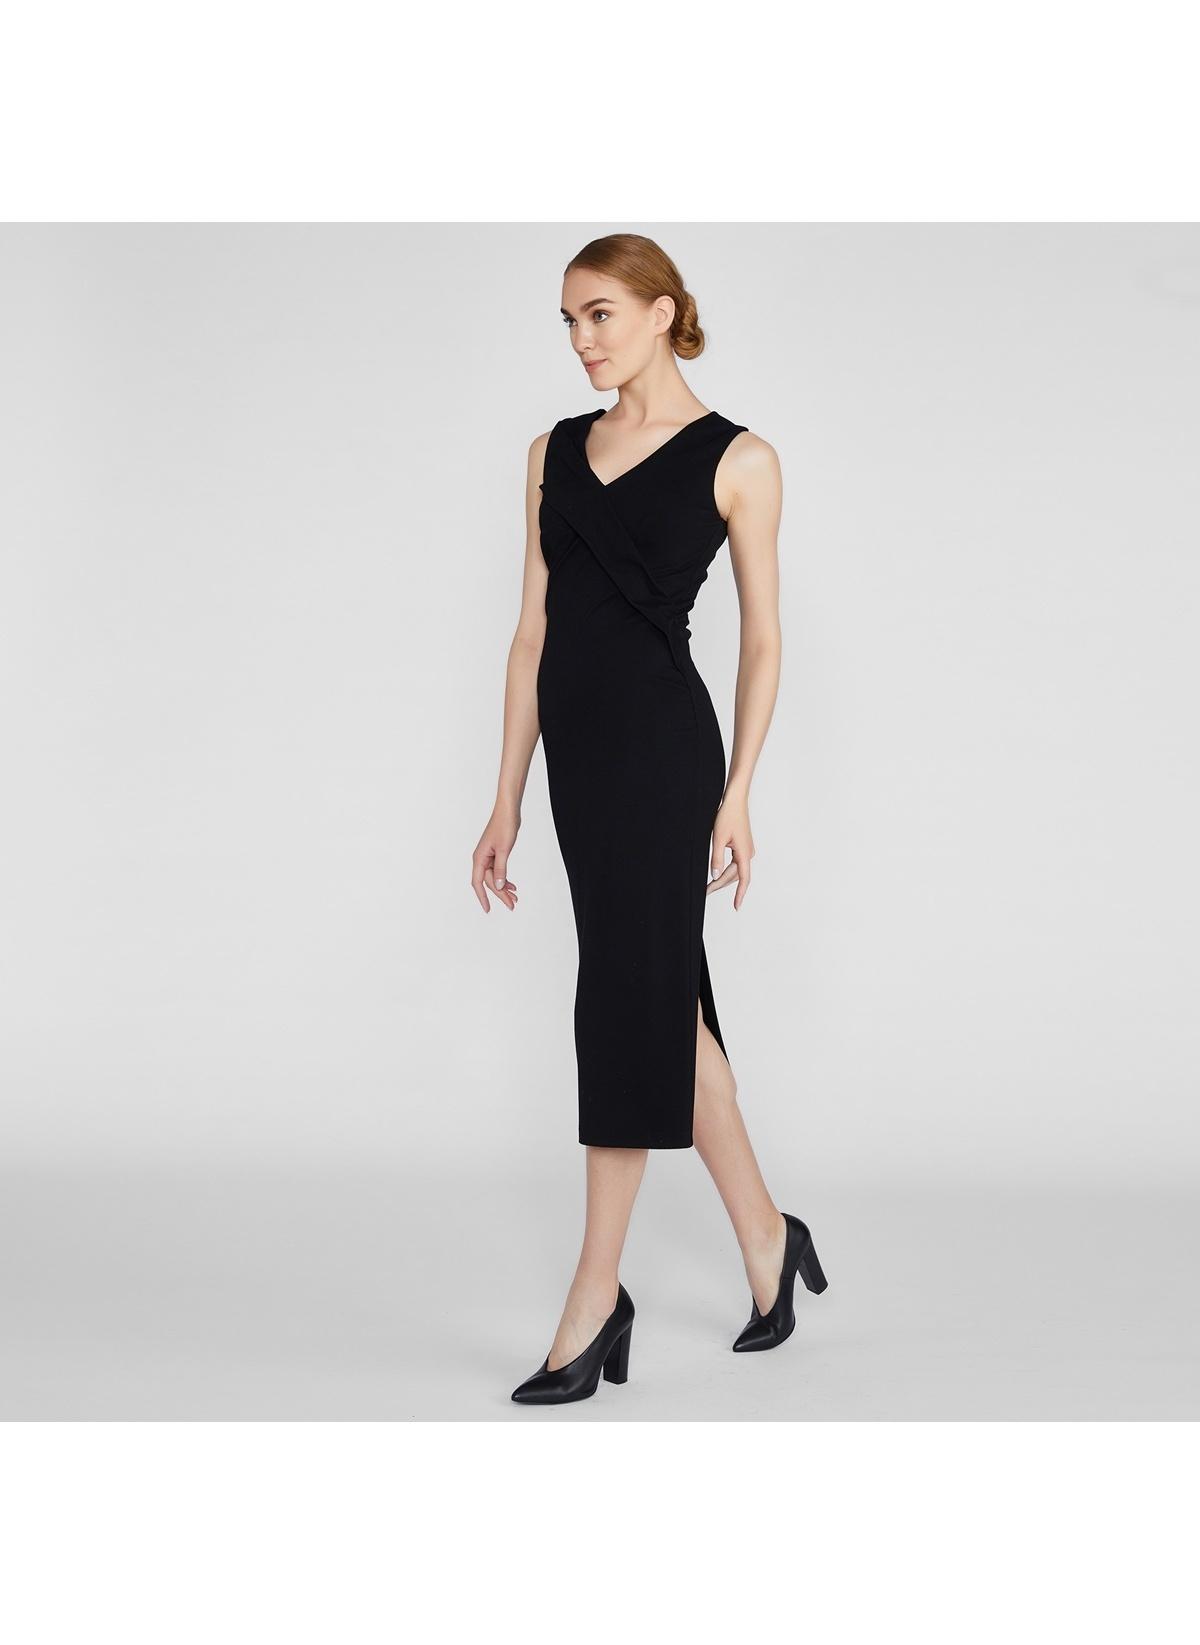 e3080b69819a9 Vekem-Limited Edition Kadın V Yaka Abiye Elbise Siyah İndirimli ...